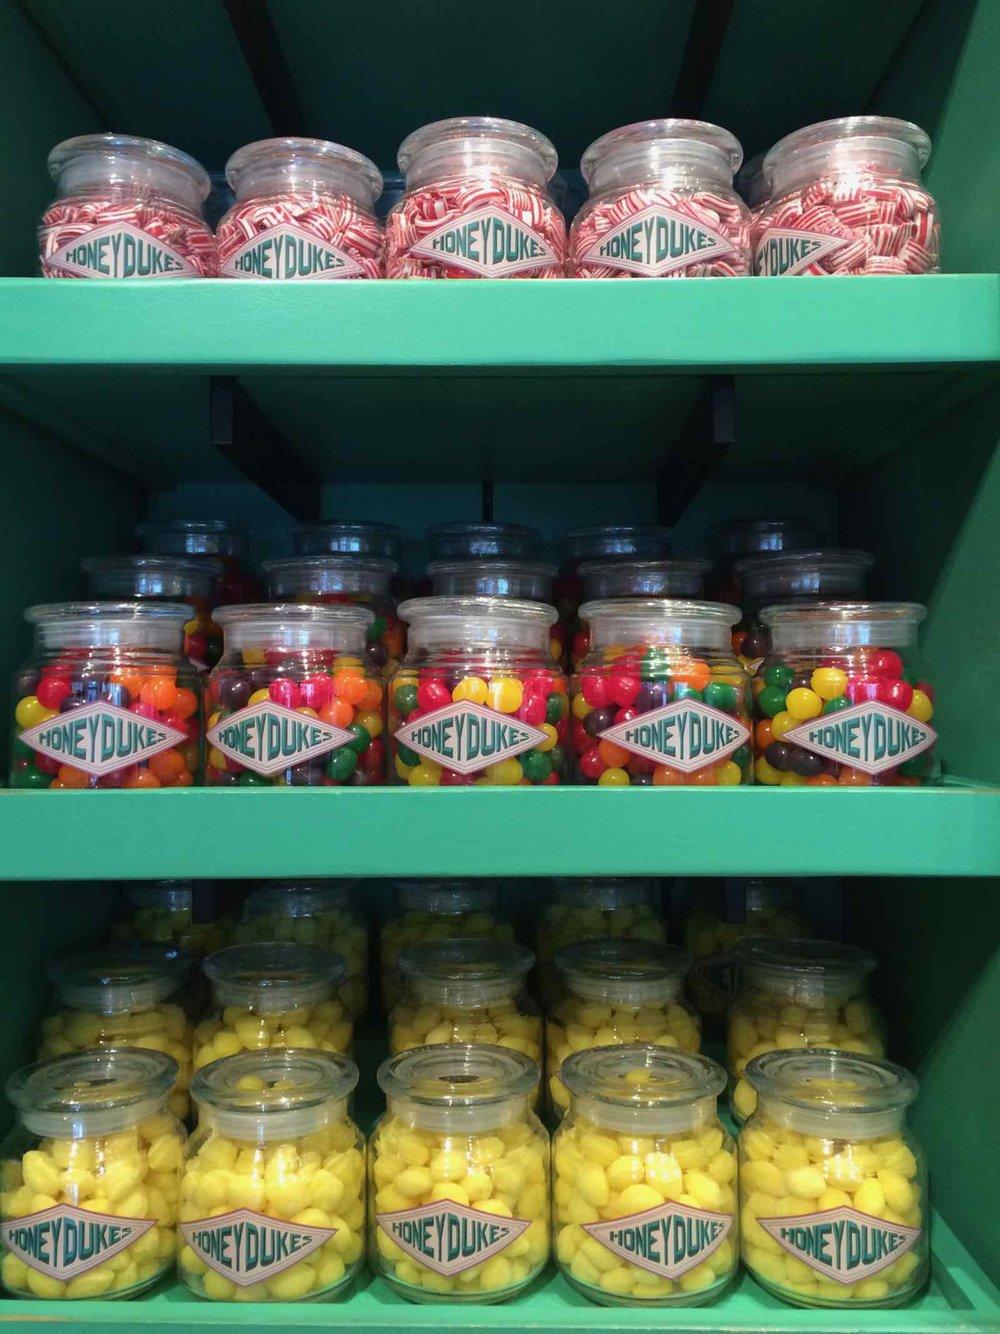 honeydukes-candy-shop.jpg